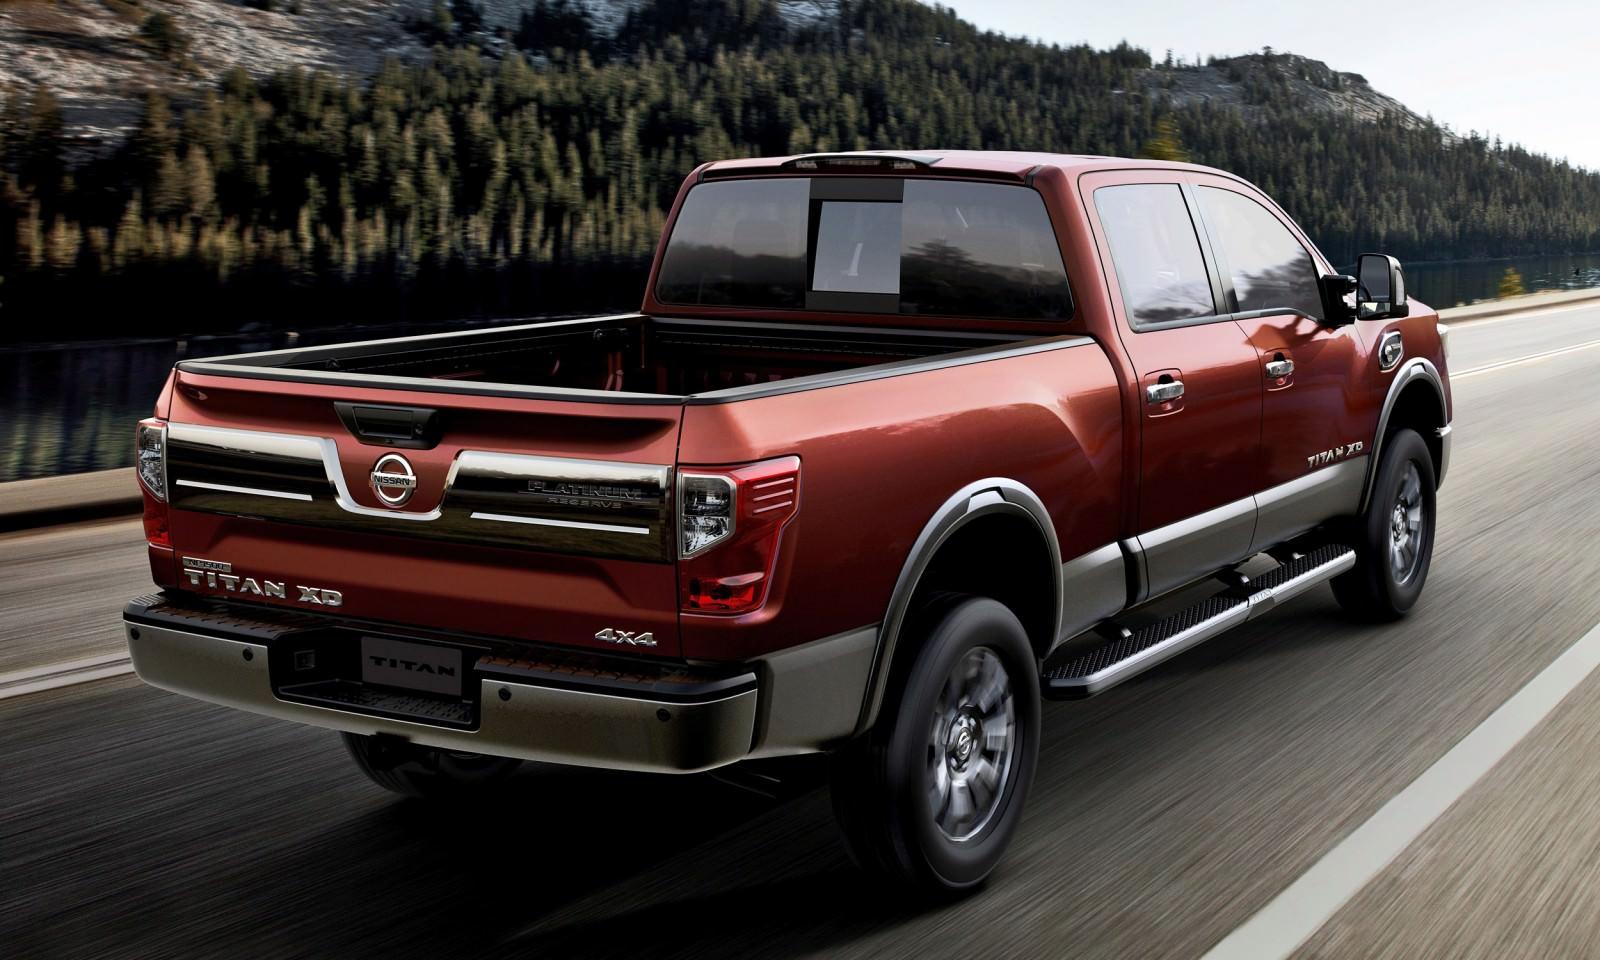 2016 nissan titan xd infographic back production model not sh car revs. Black Bedroom Furniture Sets. Home Design Ideas